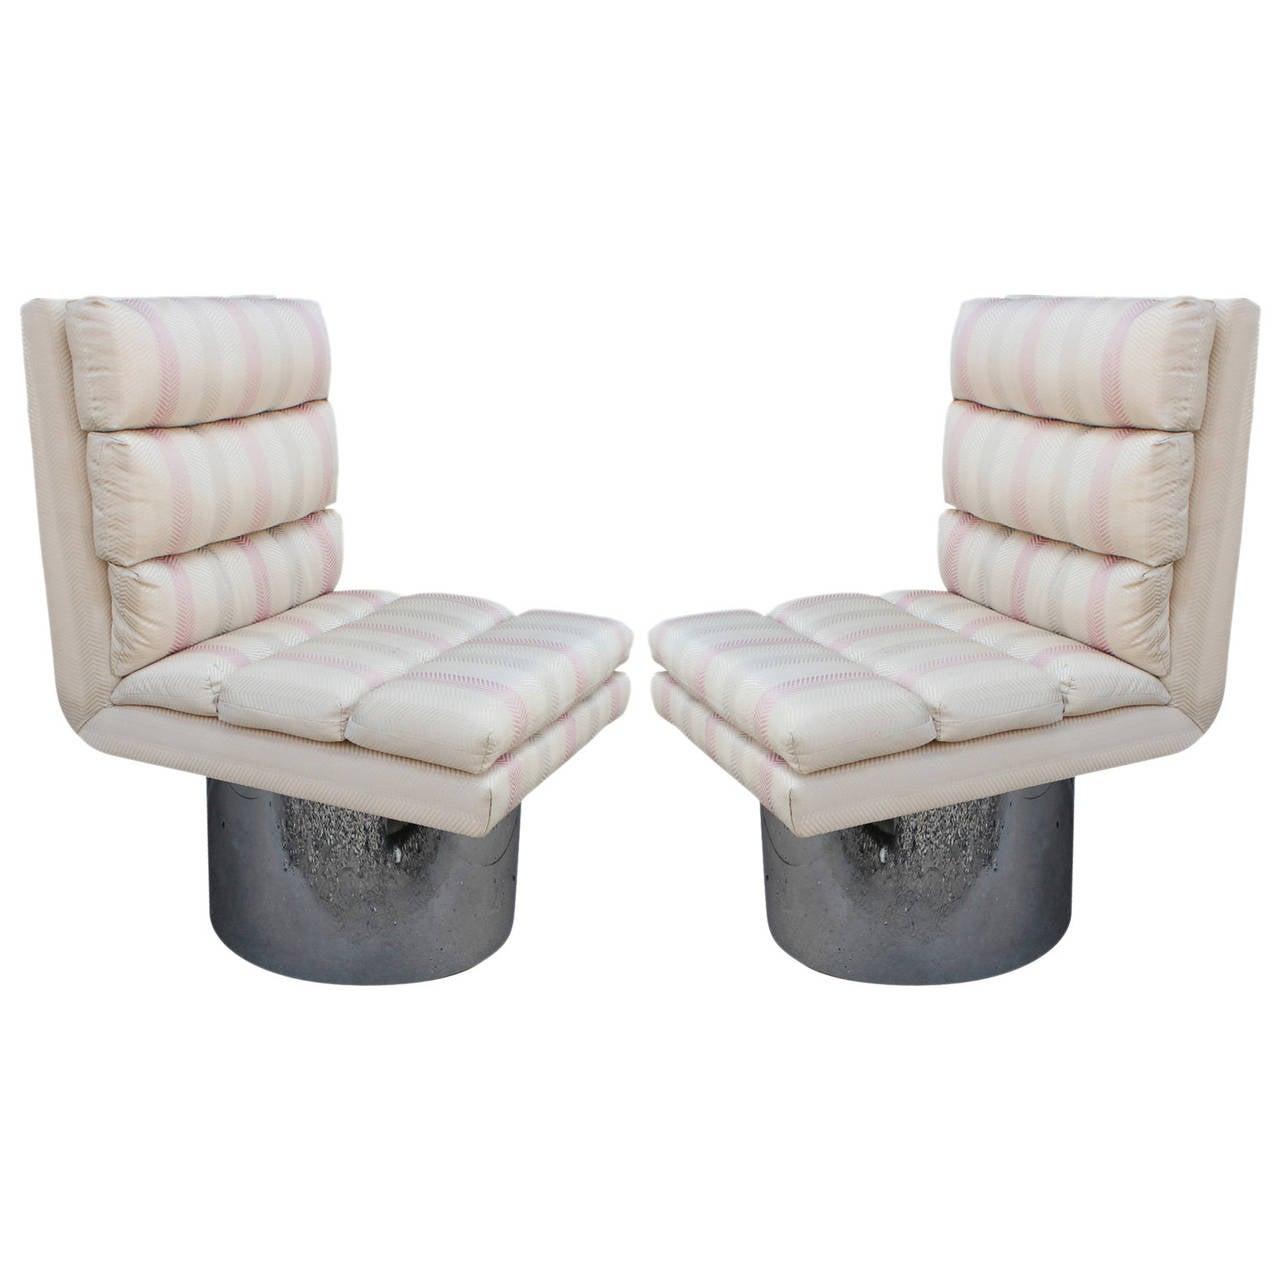 Amazing Modern Swivel Lounge Chairs on Chrome Barrel Bases